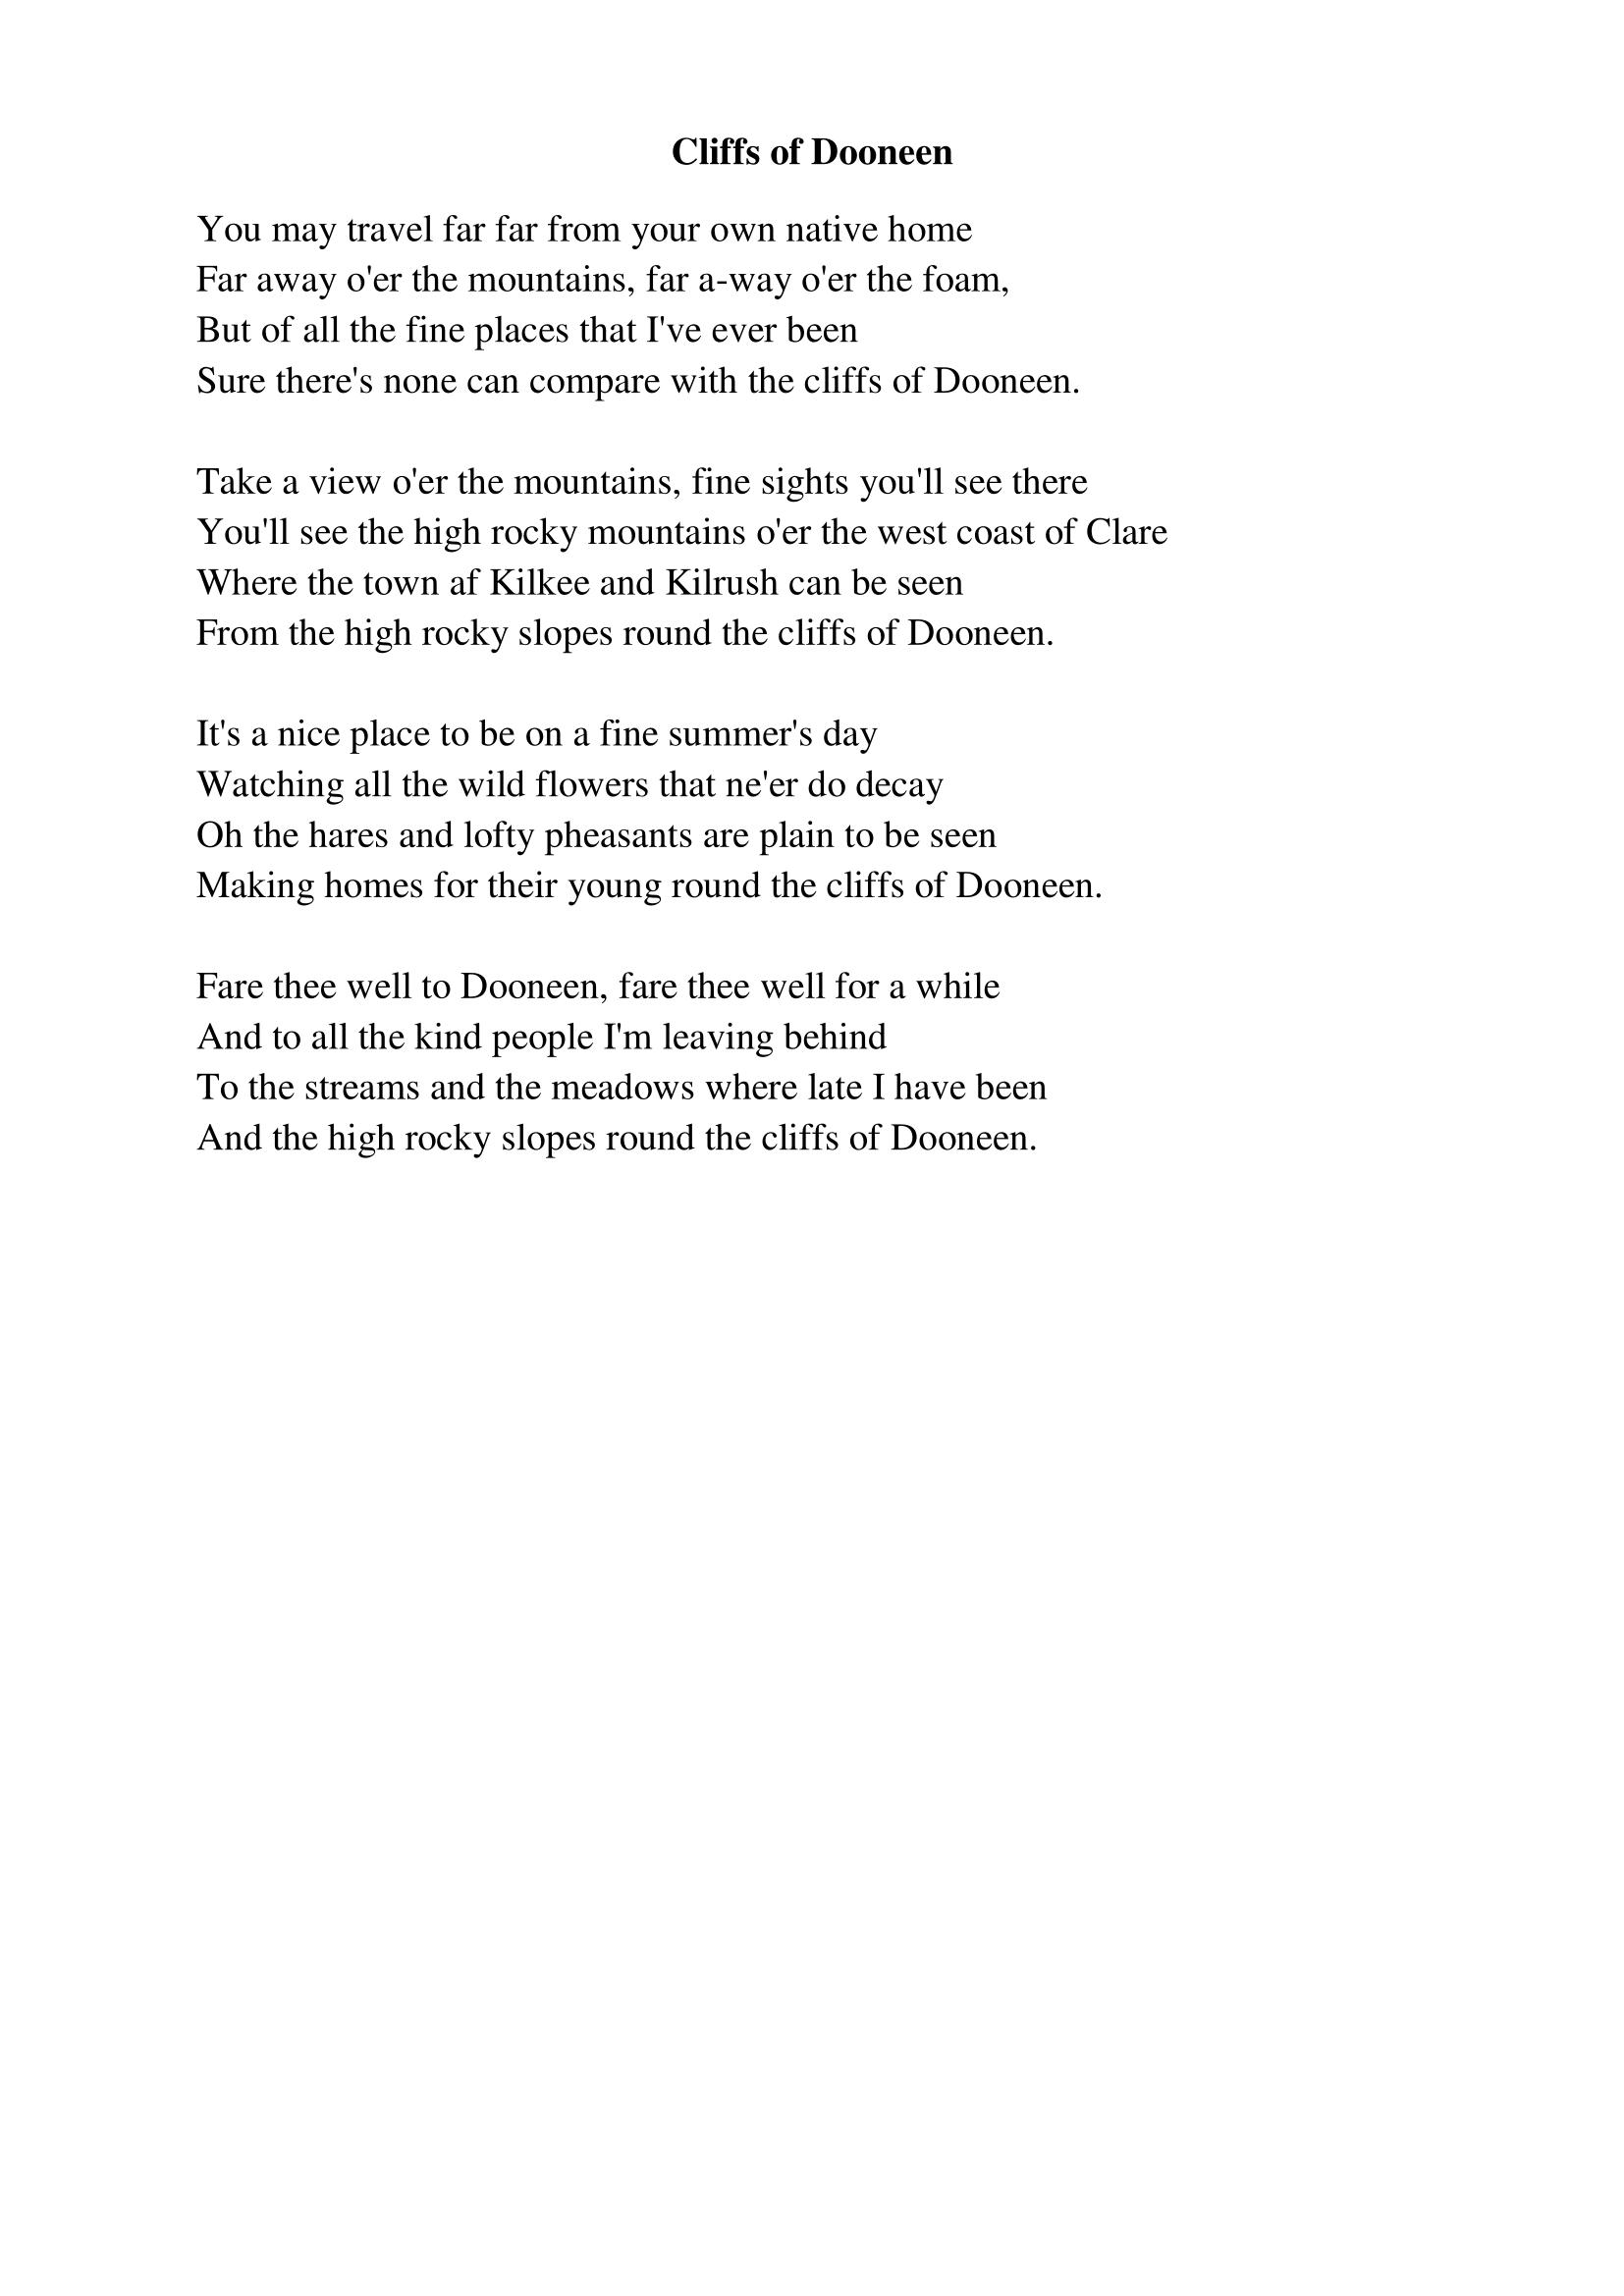 cliffs-of-dooneen-lyrics-1